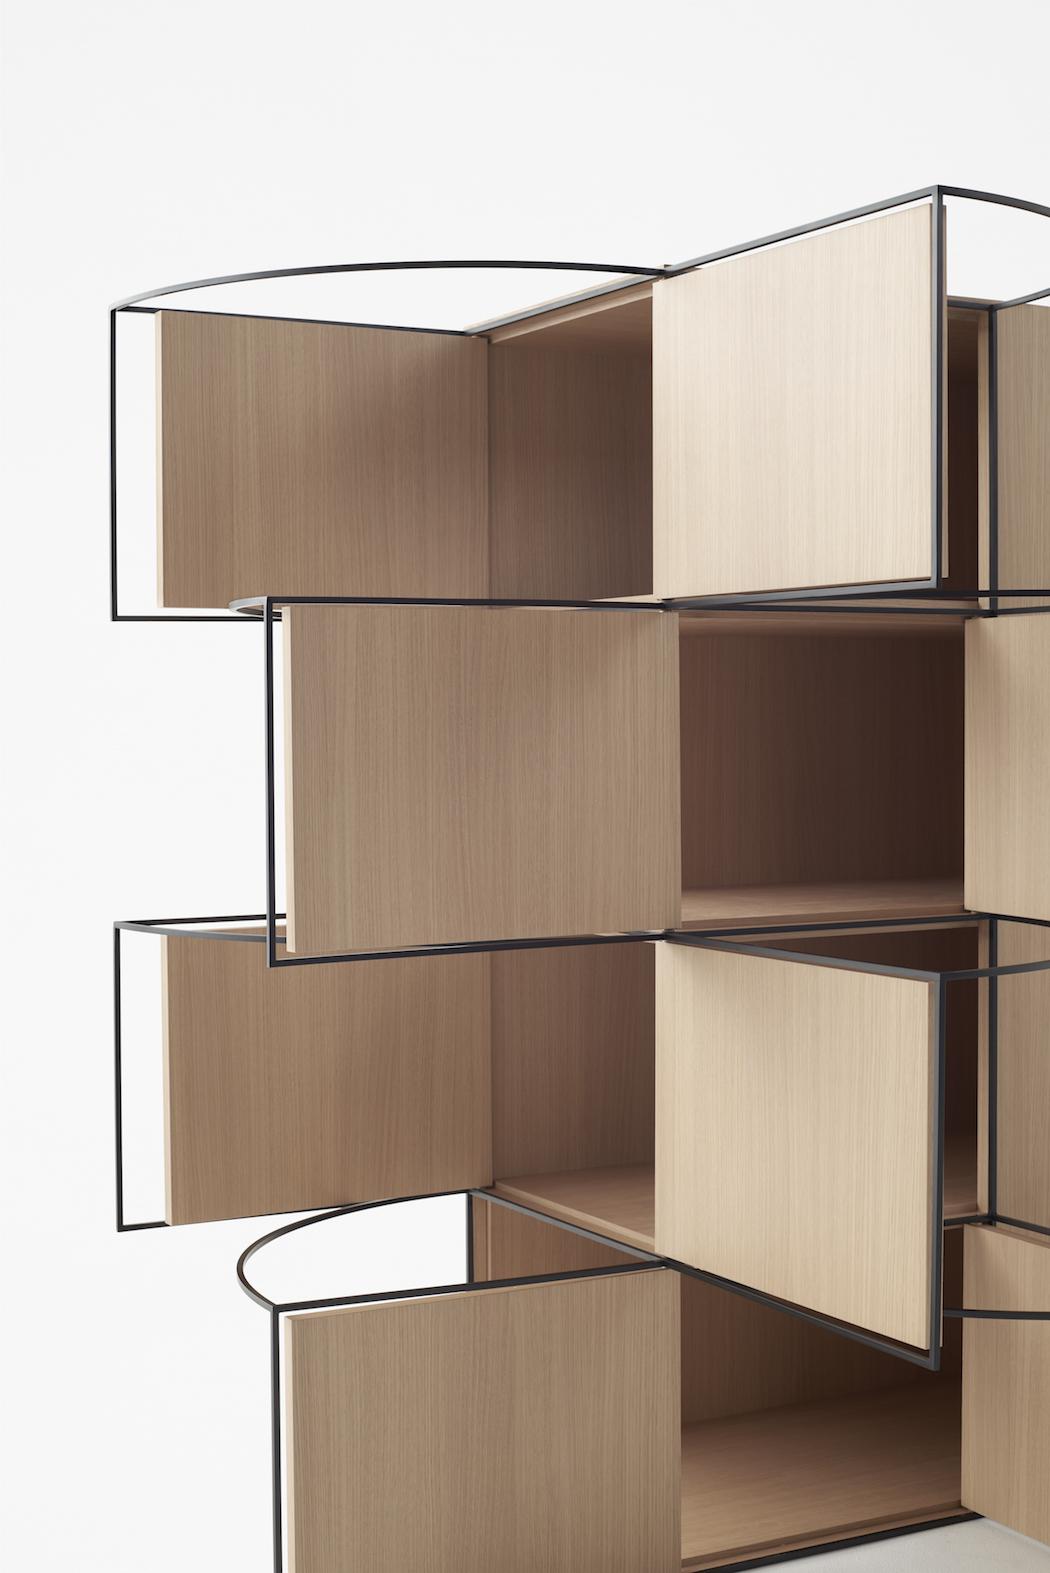 Nendo_design-container55_akihiro_yoshida